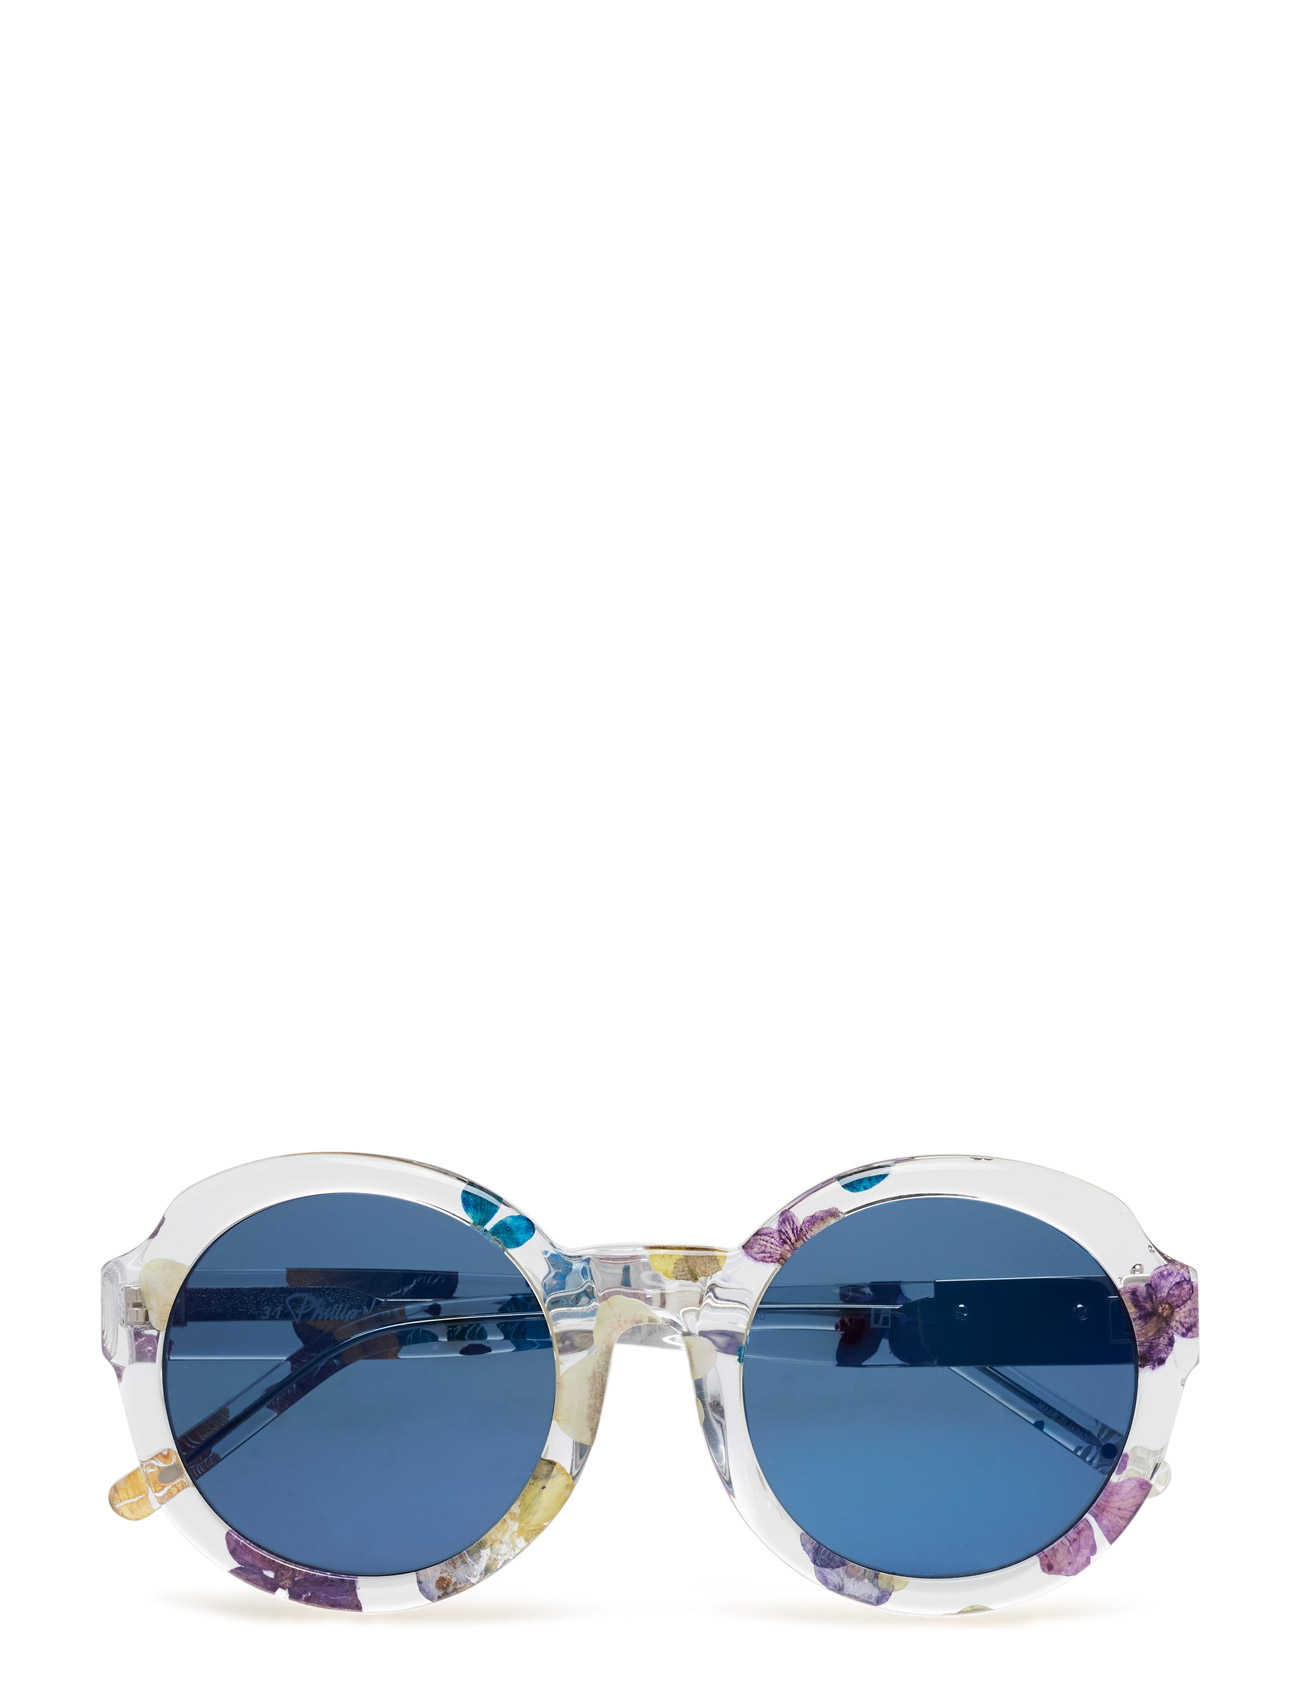 Phillip Lim 141 C4 3.1 Phillip Lim Sunglasses Solbriller til Damer i